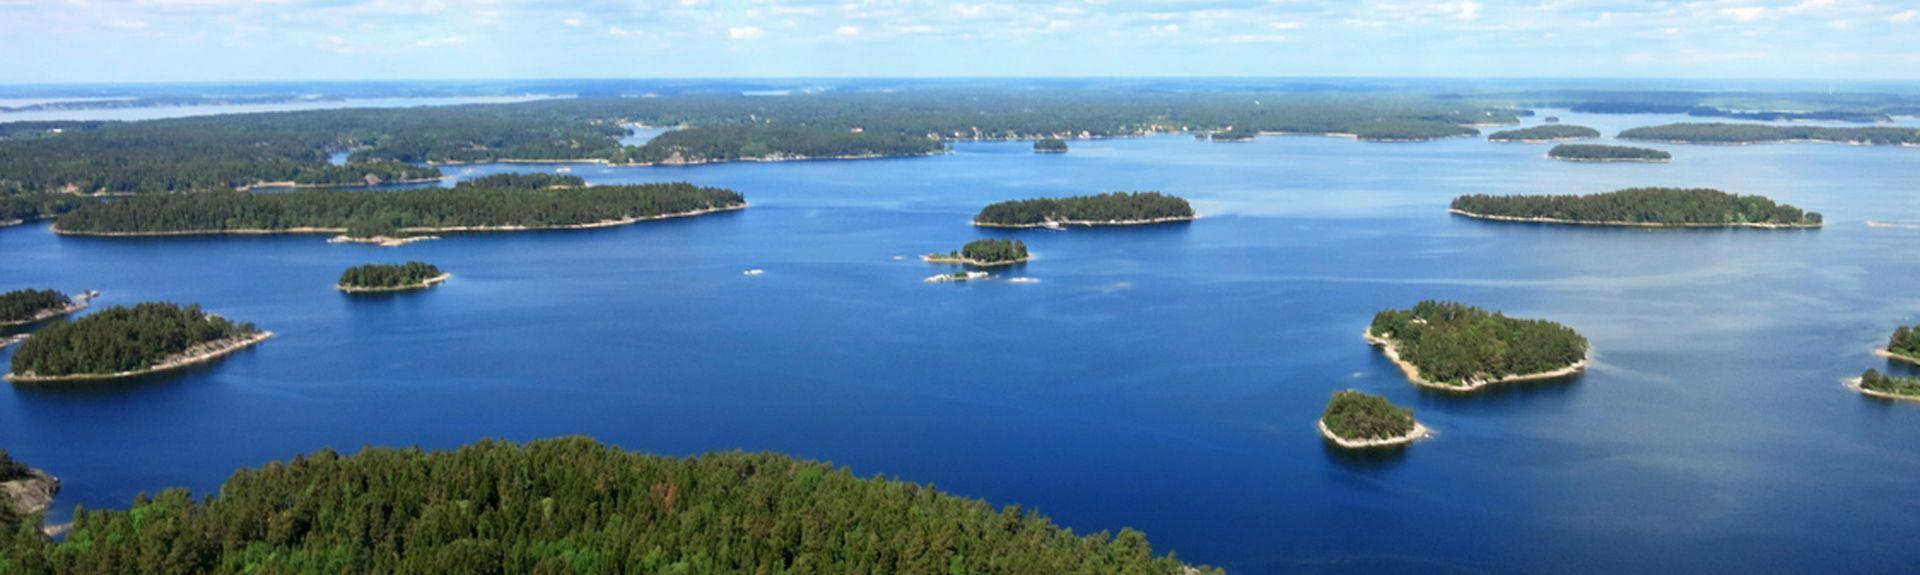 Akersberga, Stockholm County, Sweden